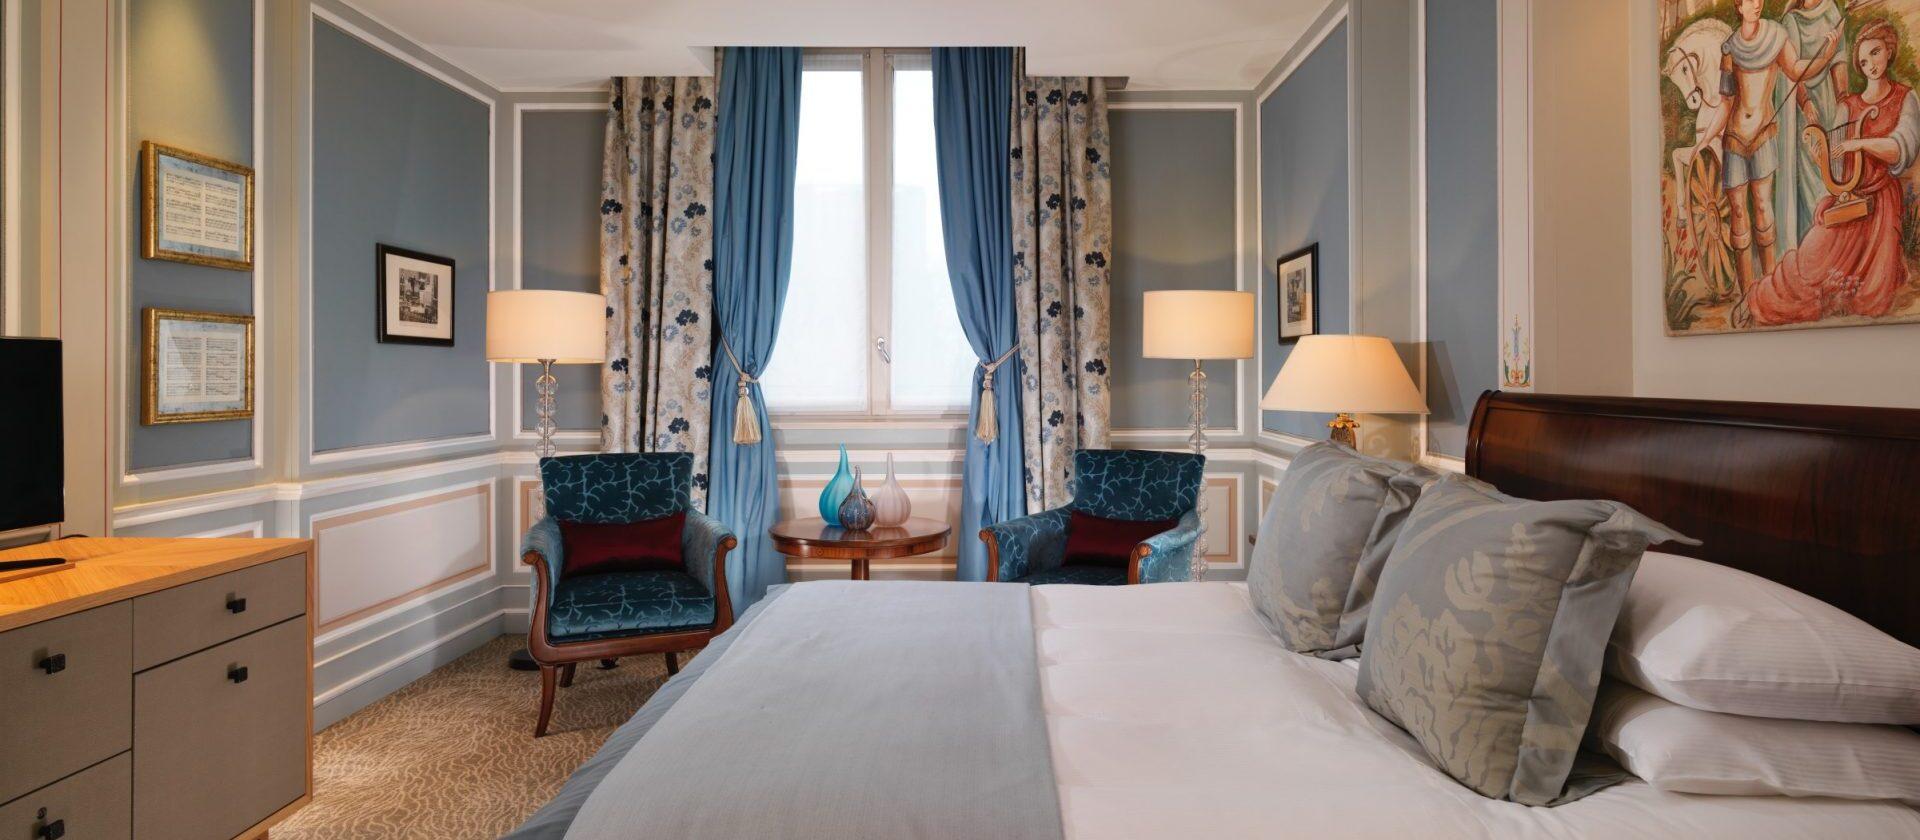 Mosaic Room, Hotel Principe di Savoia